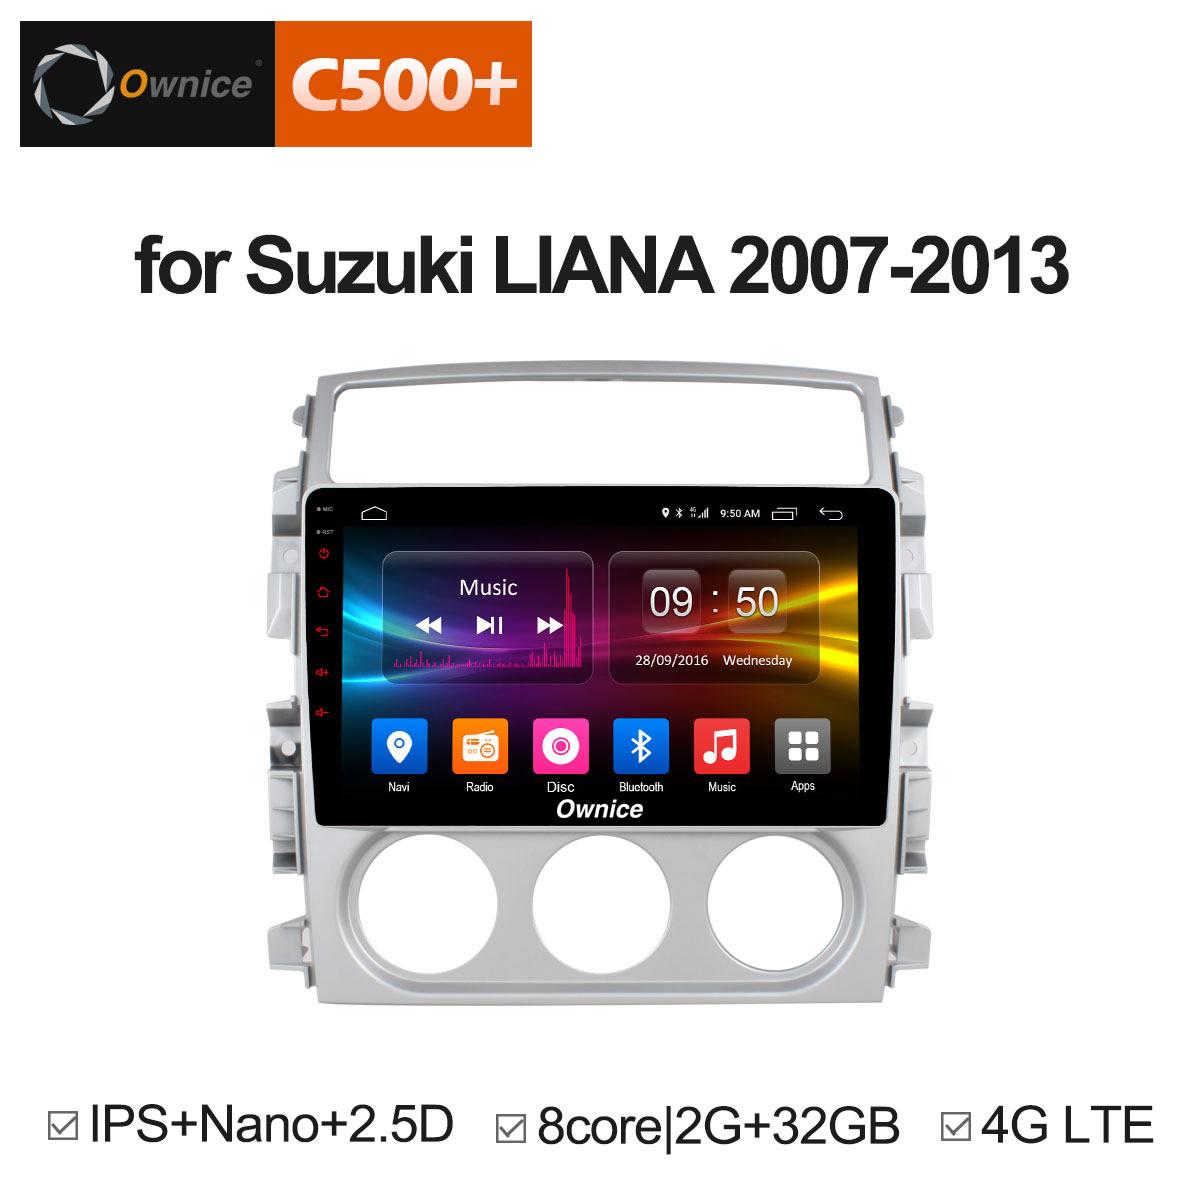 Đầu android C500+ theo xe Suzuki LIANA 2007 - 2013 :: OL-9623P